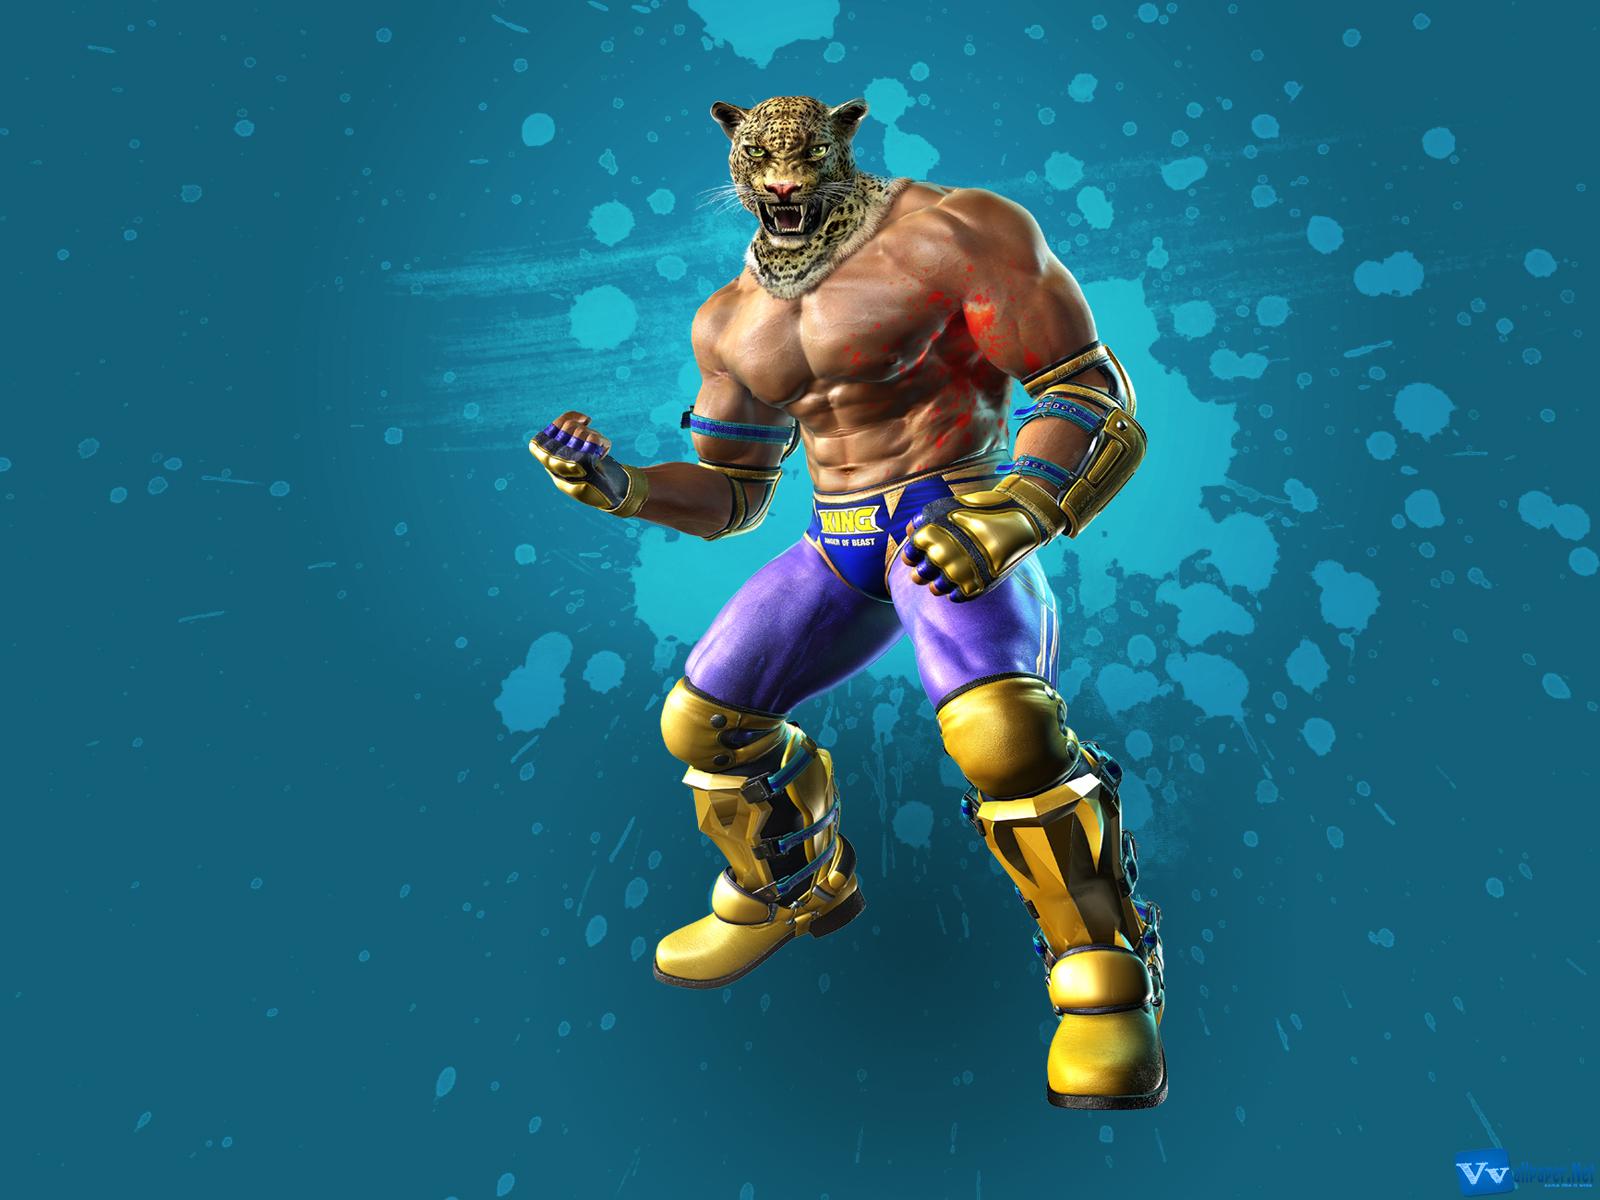 Tekken 3 King Hd Wallpaper ✓ The Galleries of HD Wallpaper